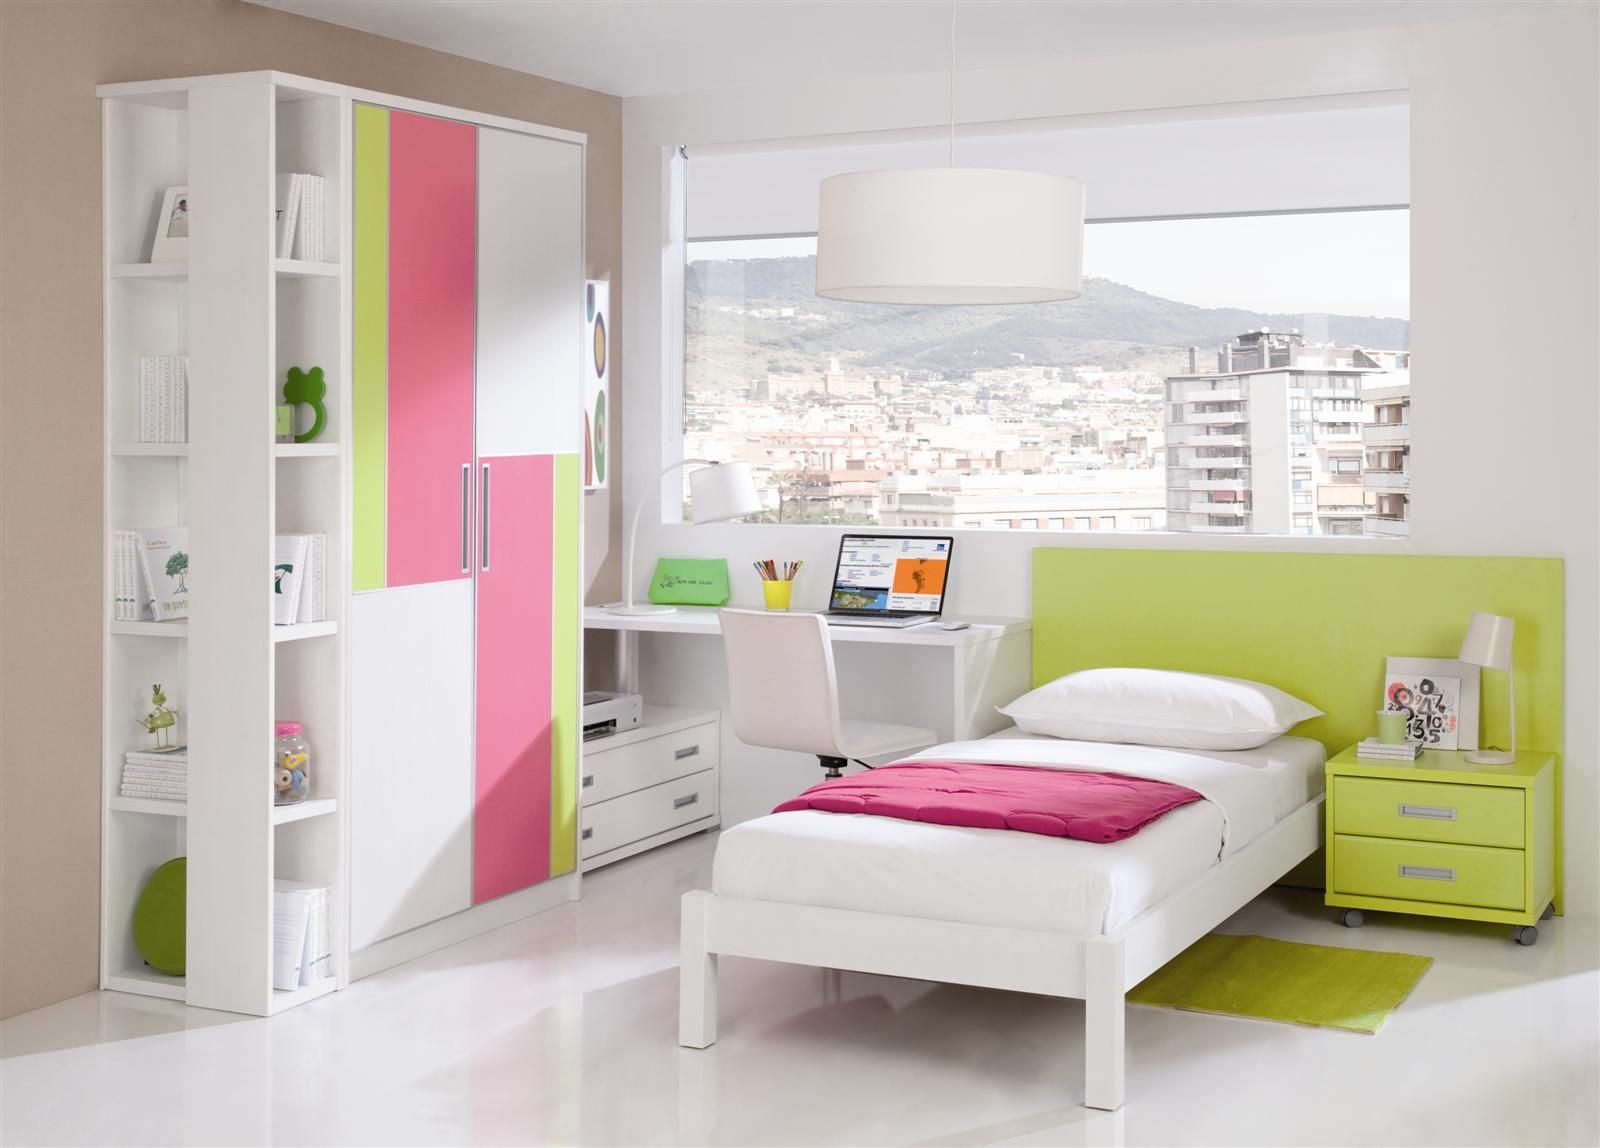 Most beautiful kids bedrooms - 22 Inspiring Kids Bedroom Furniture Designs